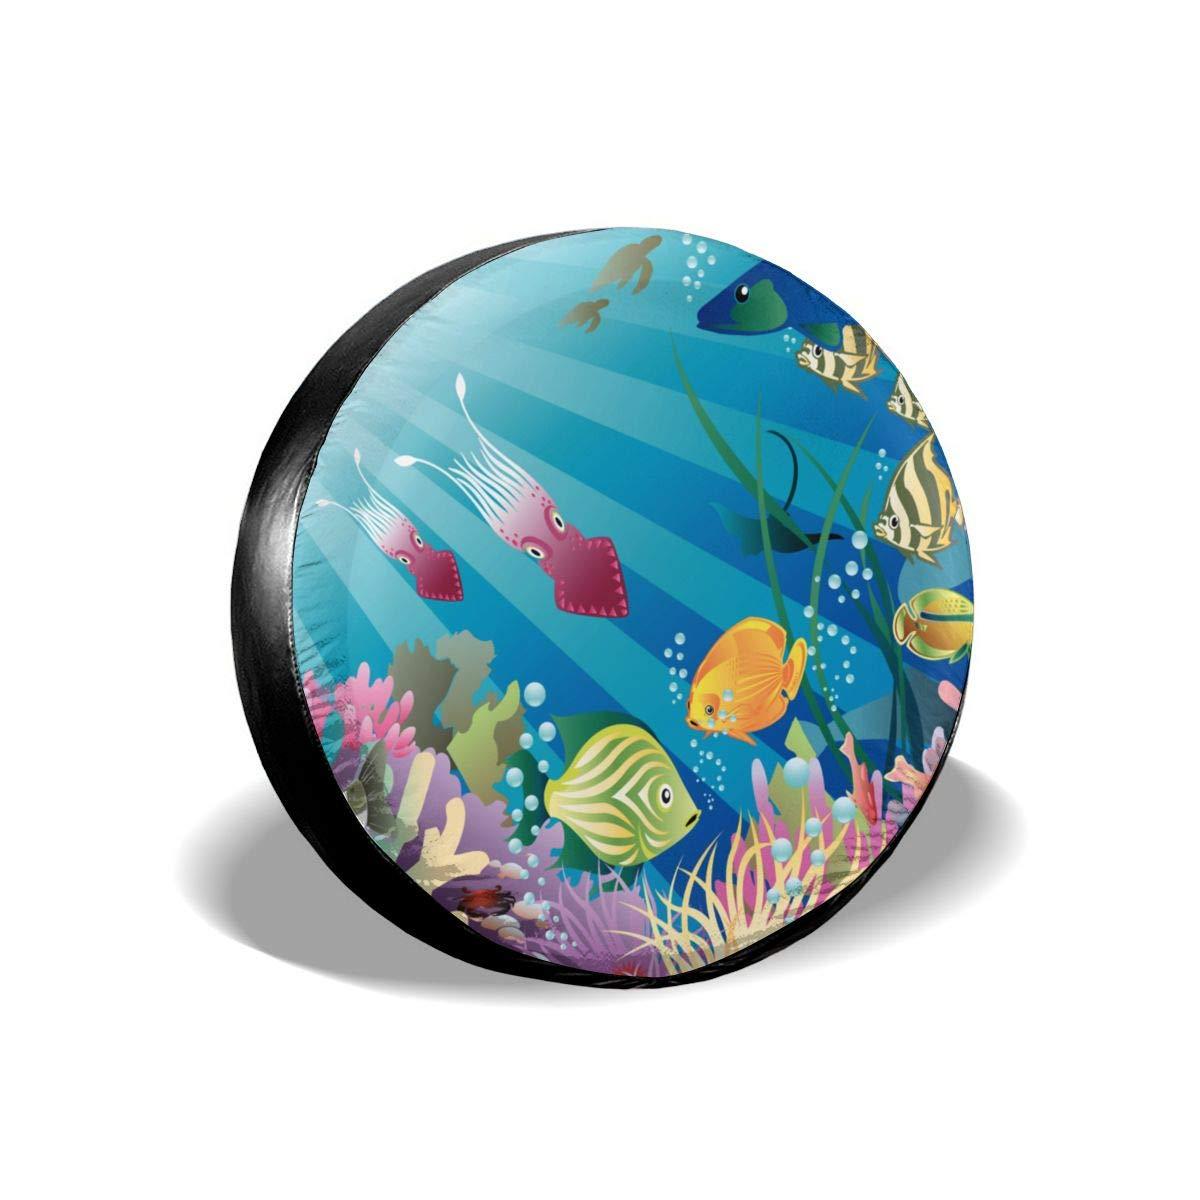 Pokuisnb Sunscreen Fish Tank Aquarium Alphabet Spare Tire Covers for All Cars 17 Inch